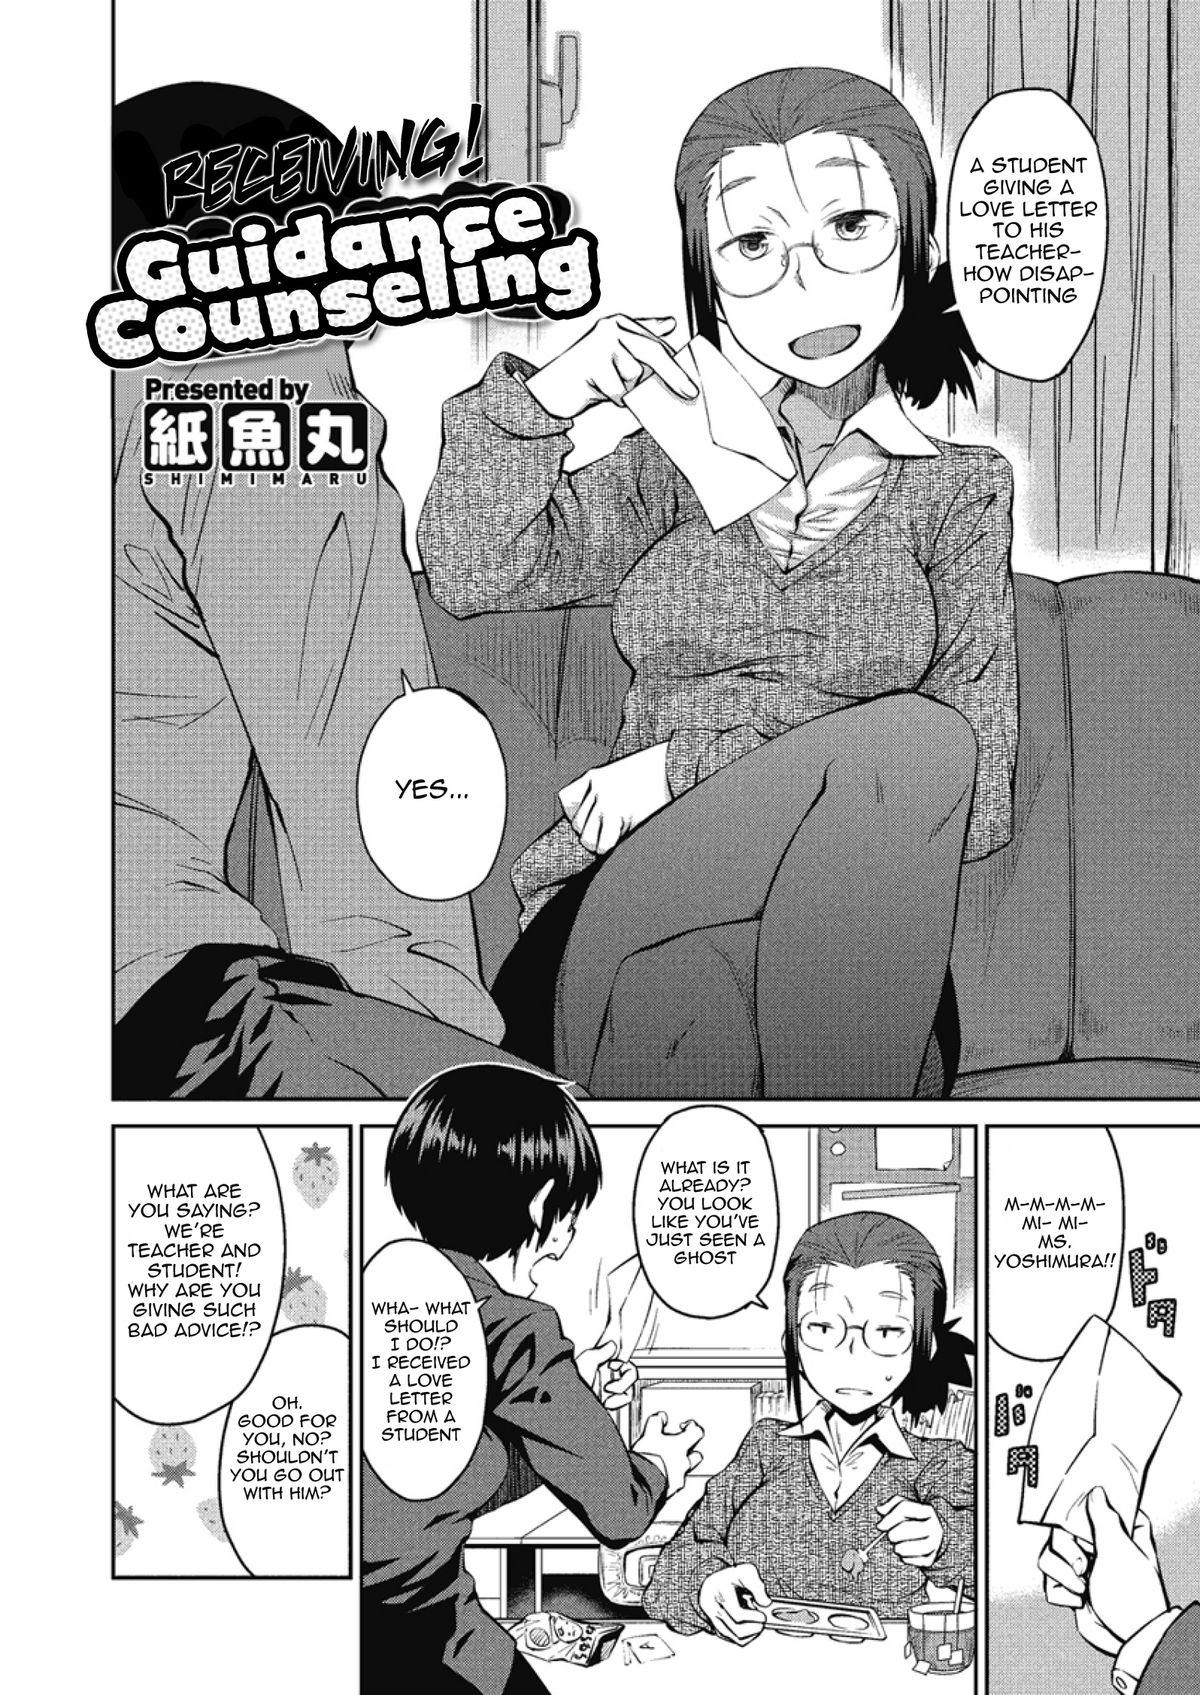 Itadaki! Seito Shidou | Receiving! Guidance Counseling 1